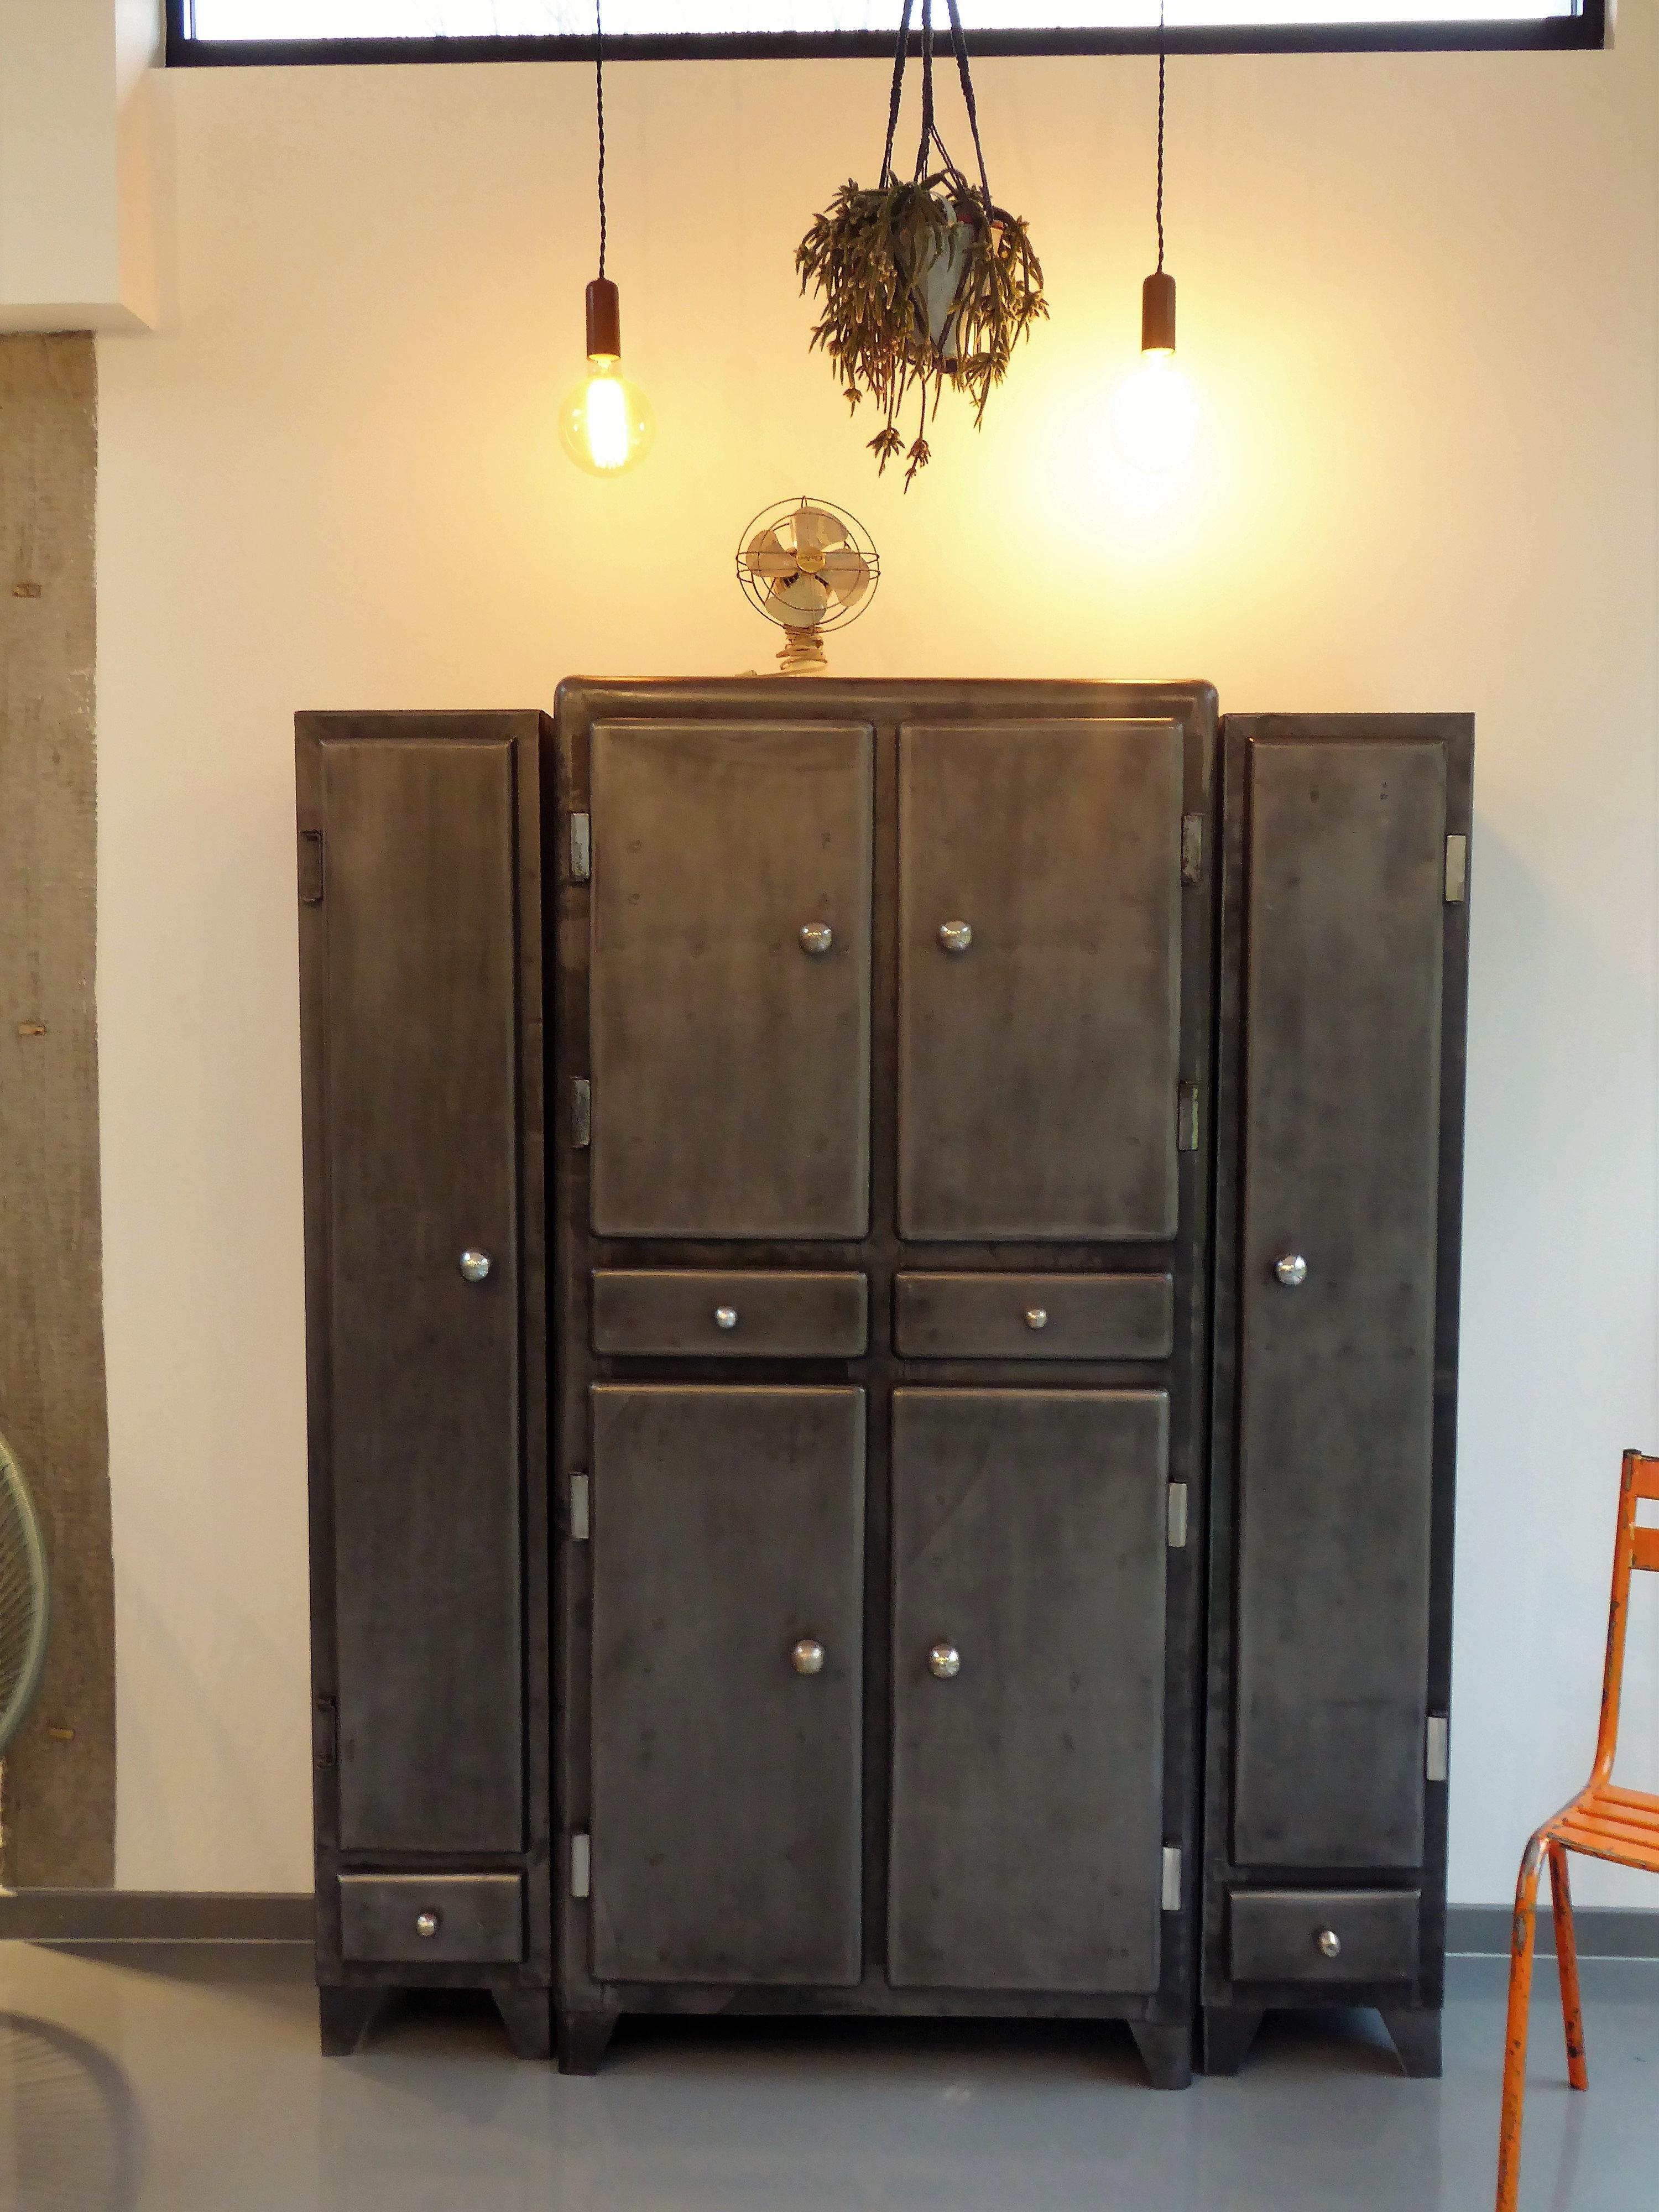 meuble industriel salle de bain salle de bain type industriel meuble salle de bain type with. Black Bedroom Furniture Sets. Home Design Ideas